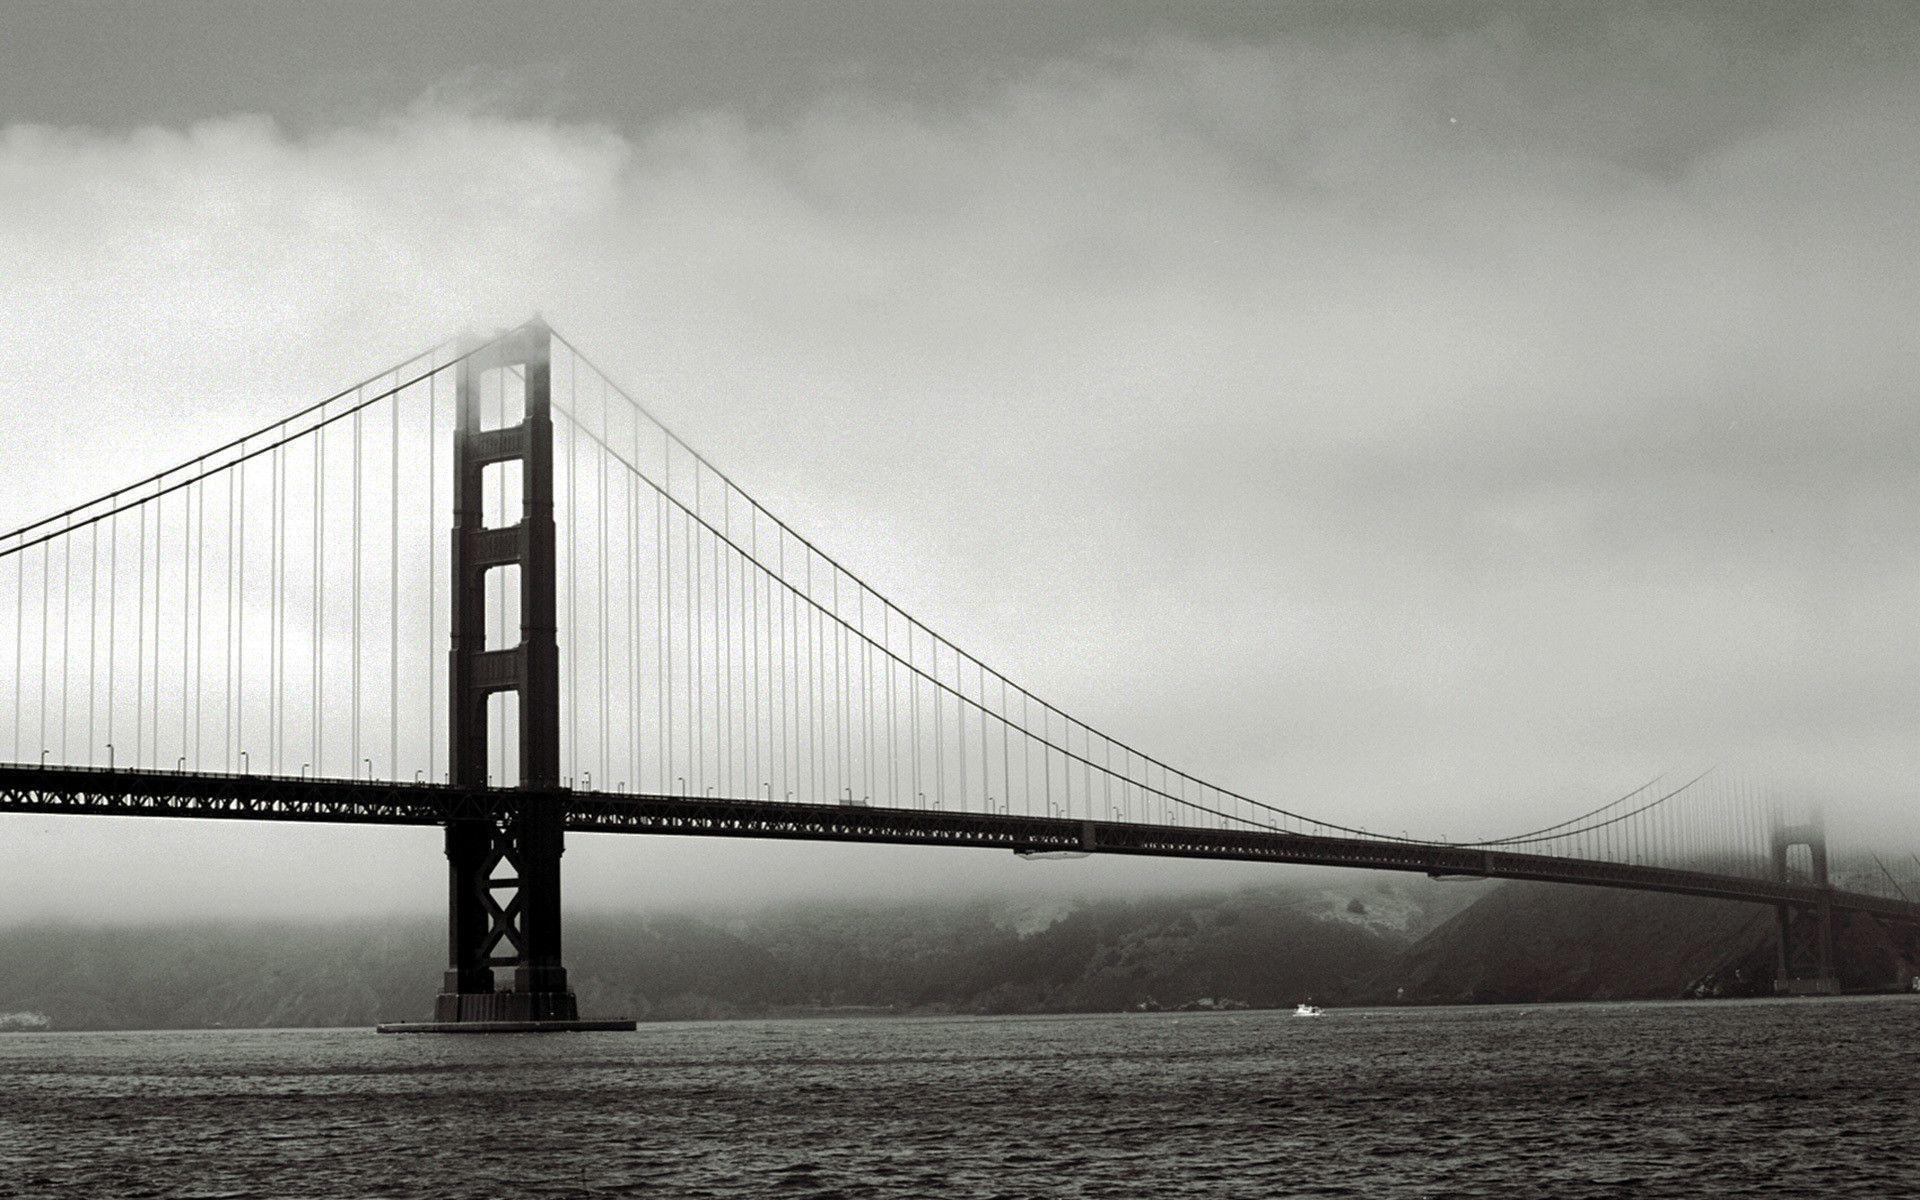 Amazing Wallpaper Night Golden Gate Bridge - Uvpqrsc  Pictures-55249.jpg